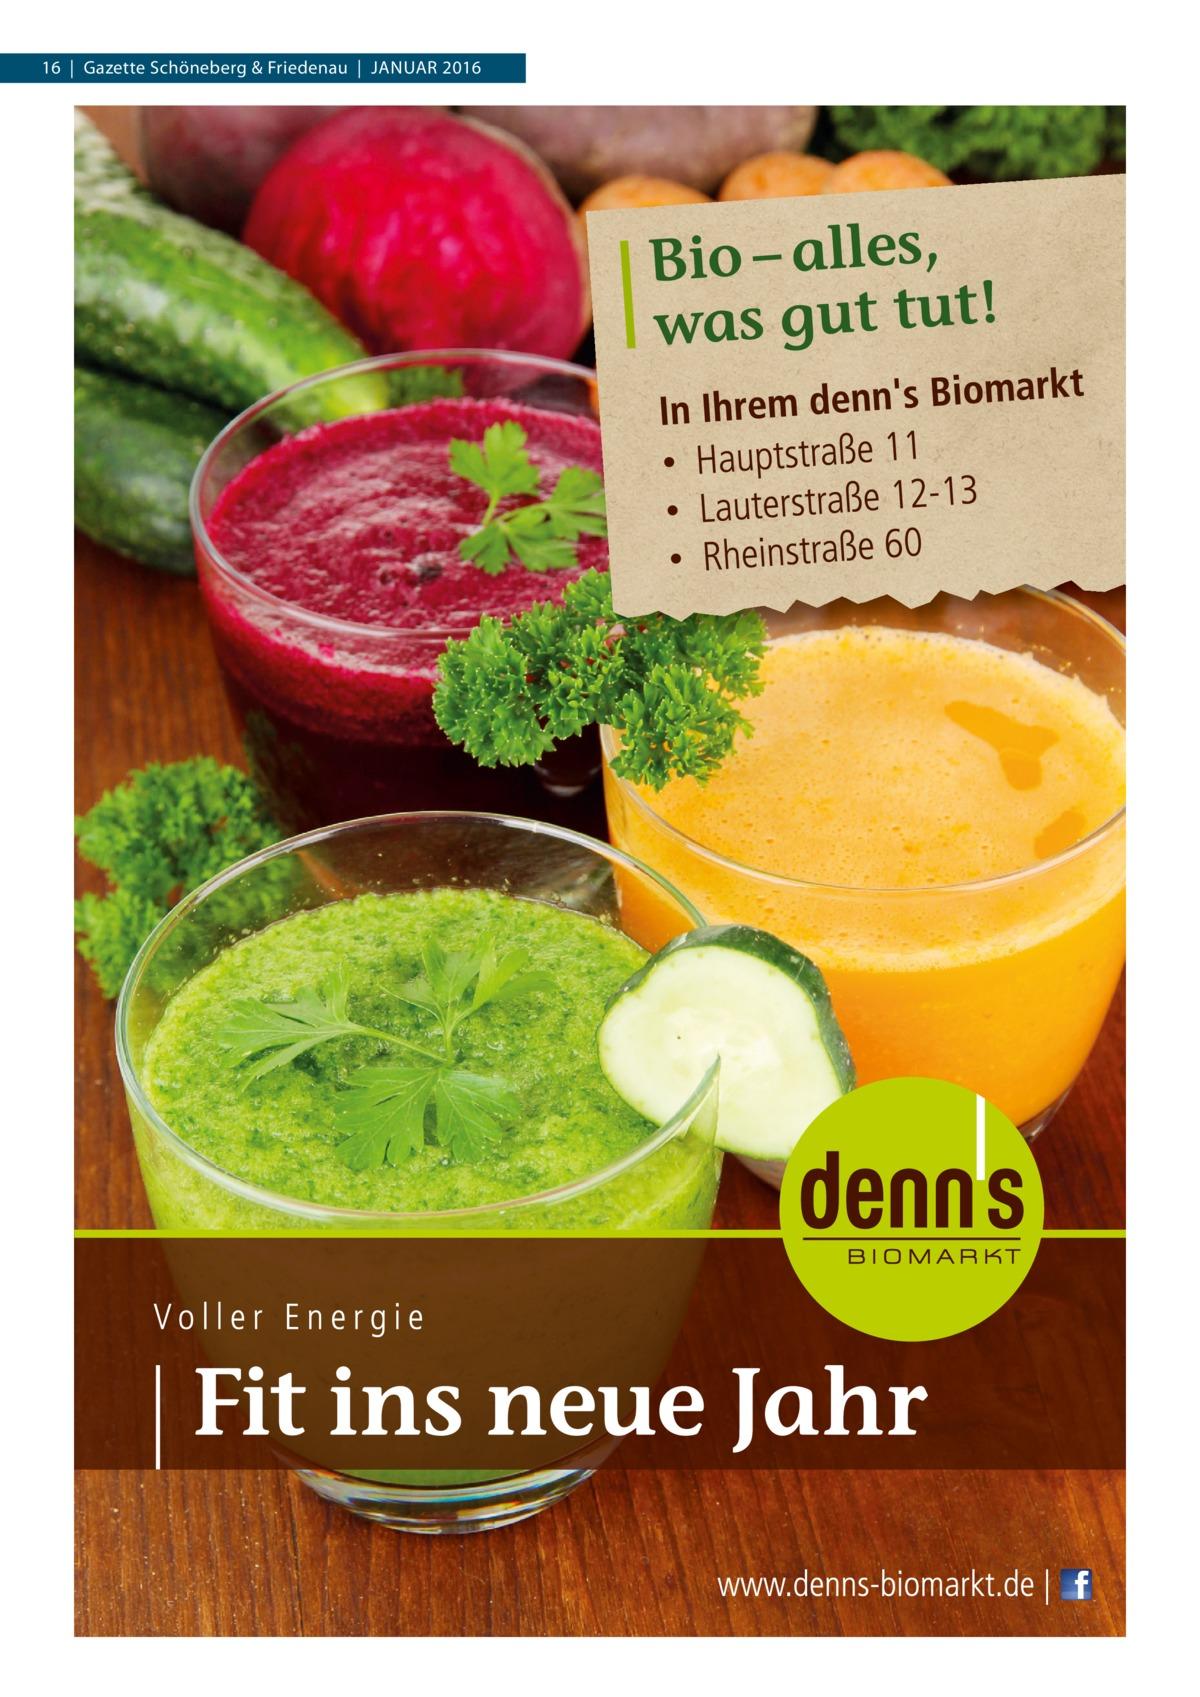 16|Gazette Schöneberg & Friedenau|Januar 2016